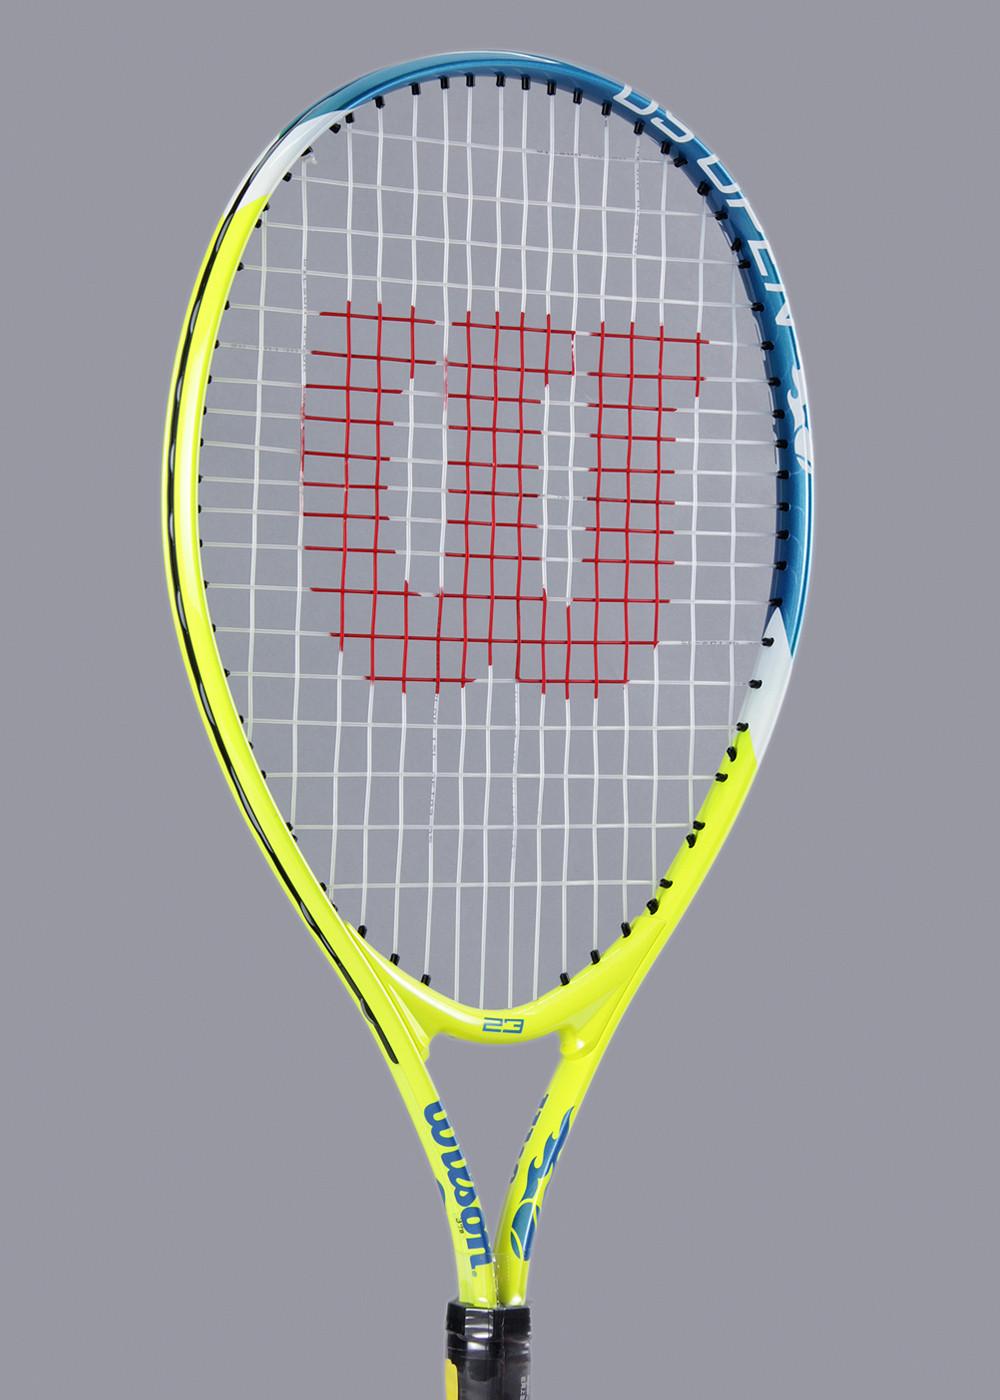 Deals | Tennis Wilson, Yonex, Cosco...